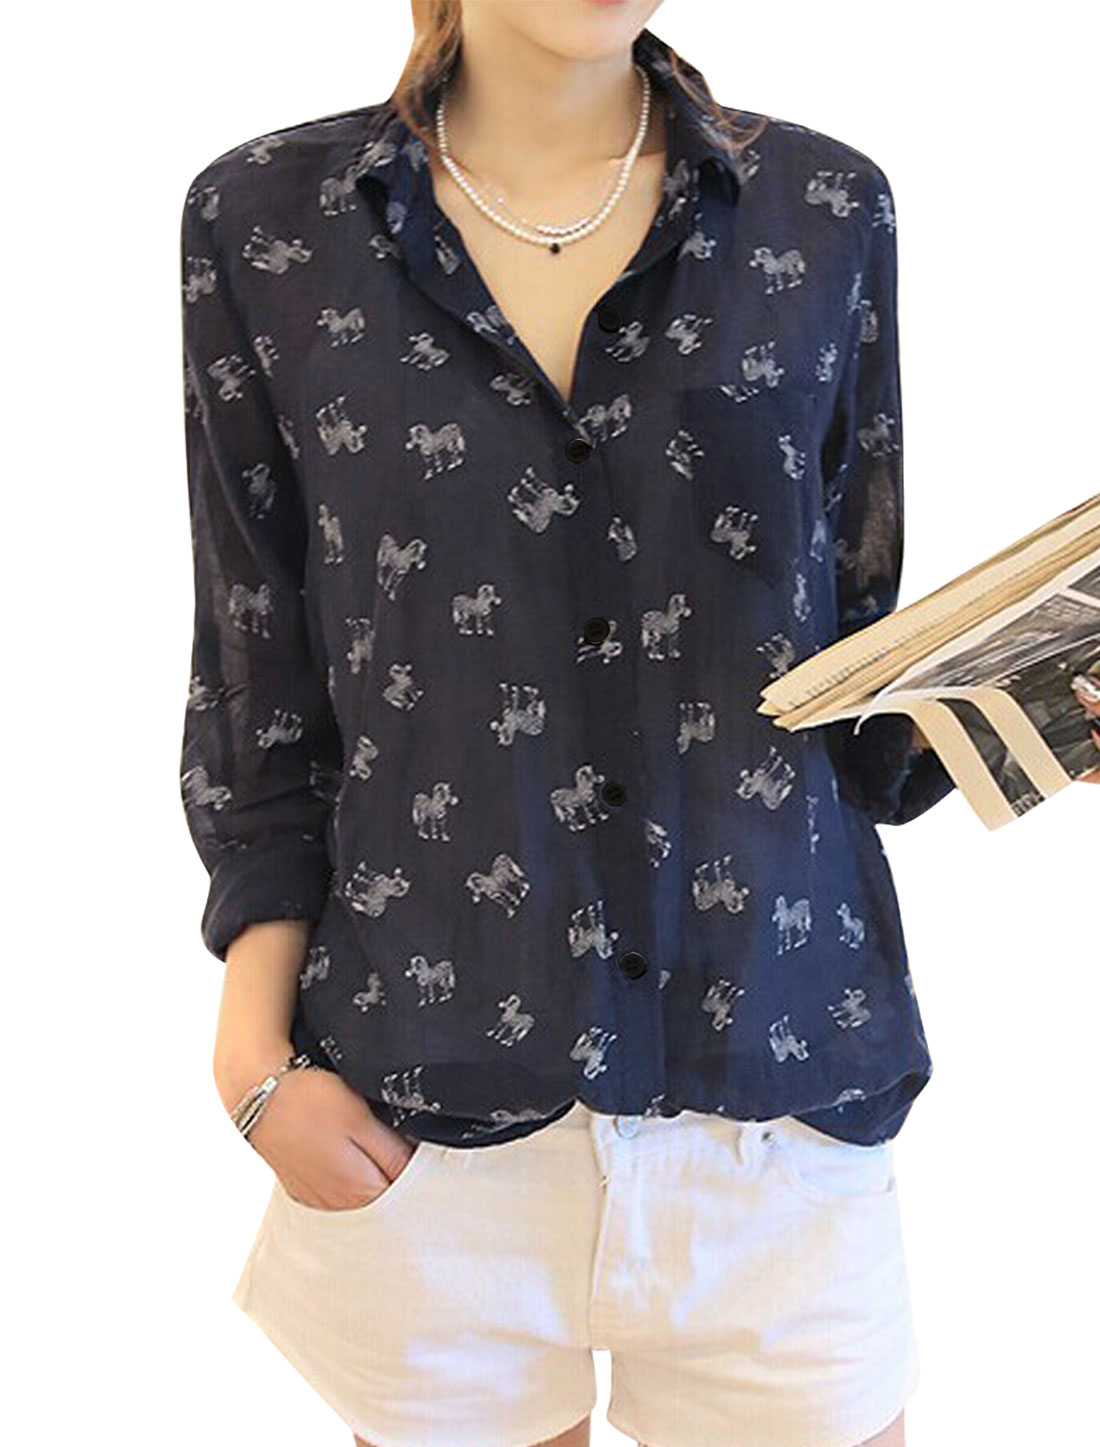 Lady Button Closure Front Zebra Pattern Round Hem Leisure Shirt Navy Blue S